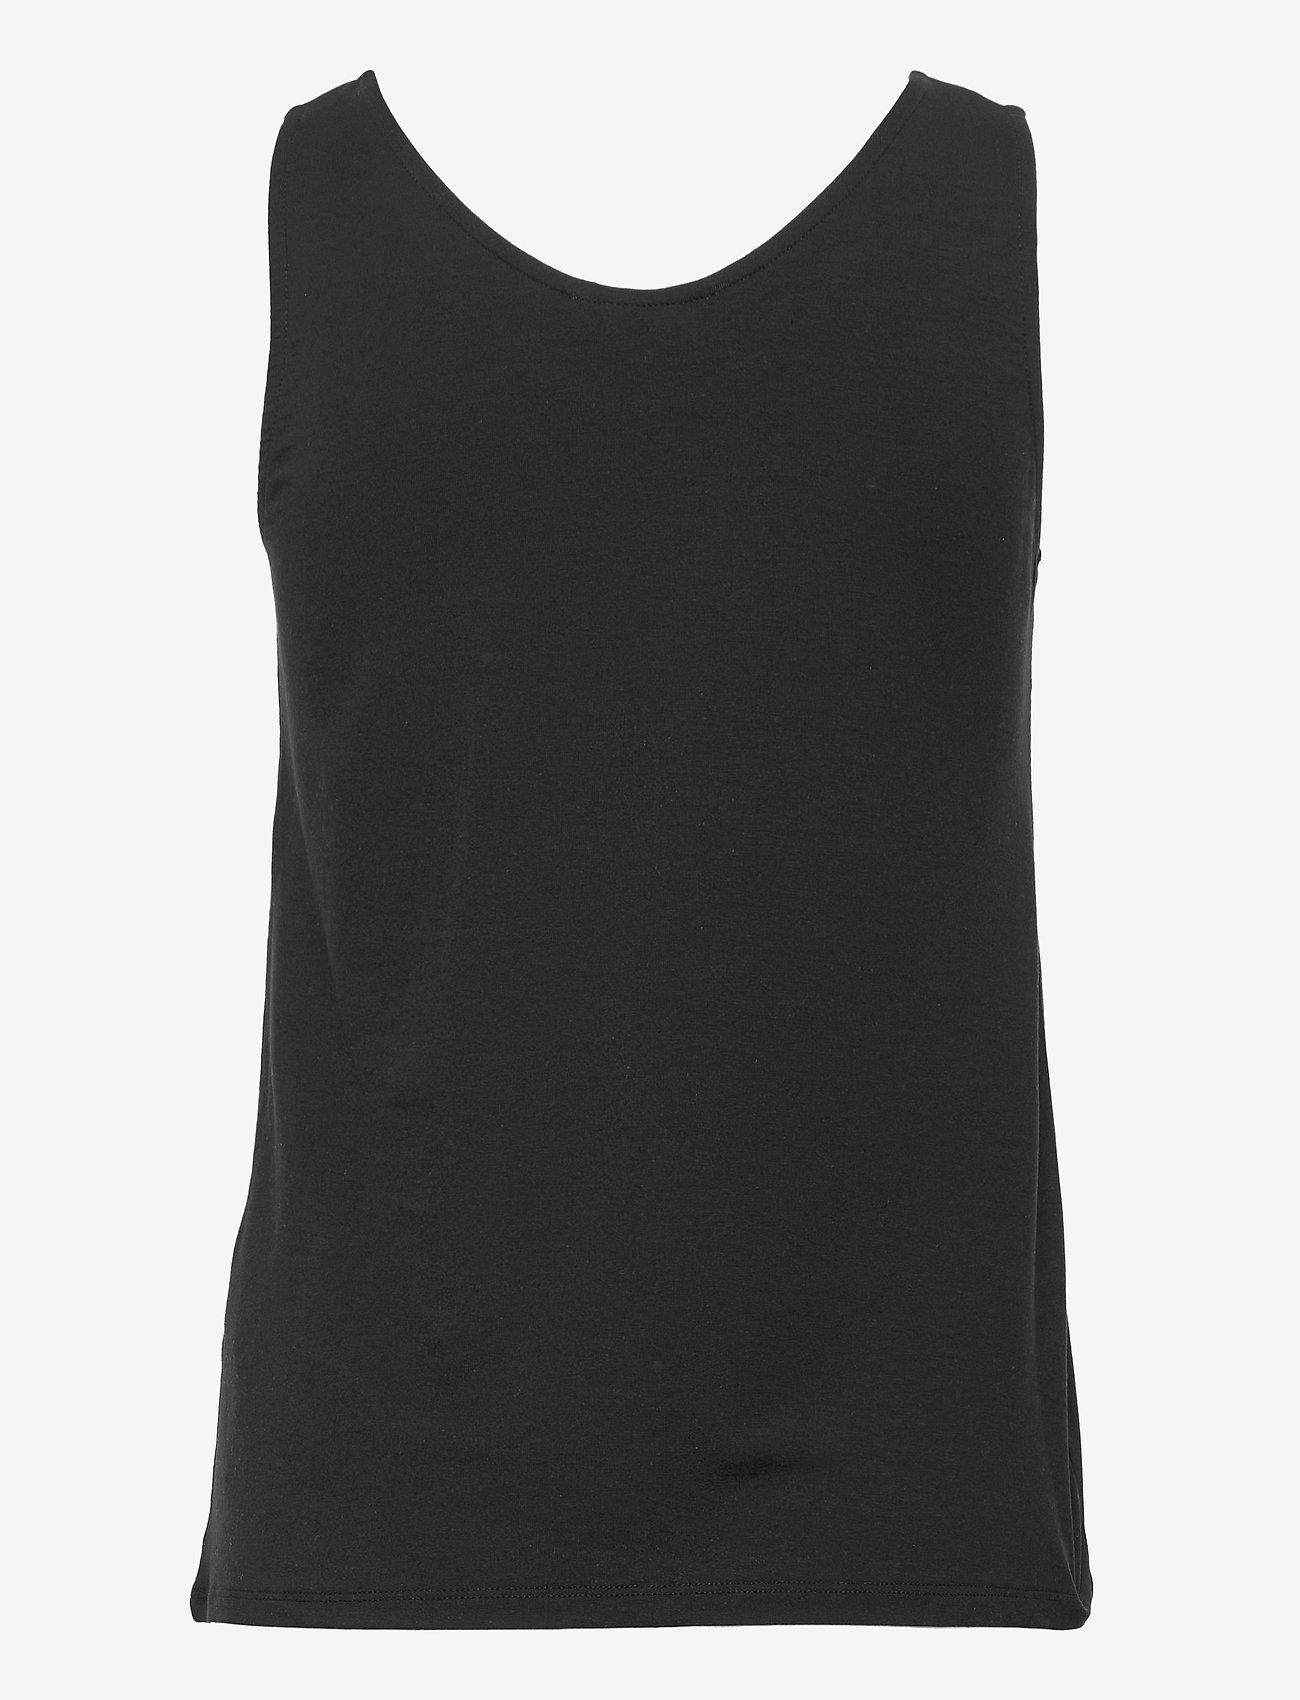 b.young - BYREXIMA TANK TOP - - t-shirt & tops - black - 1